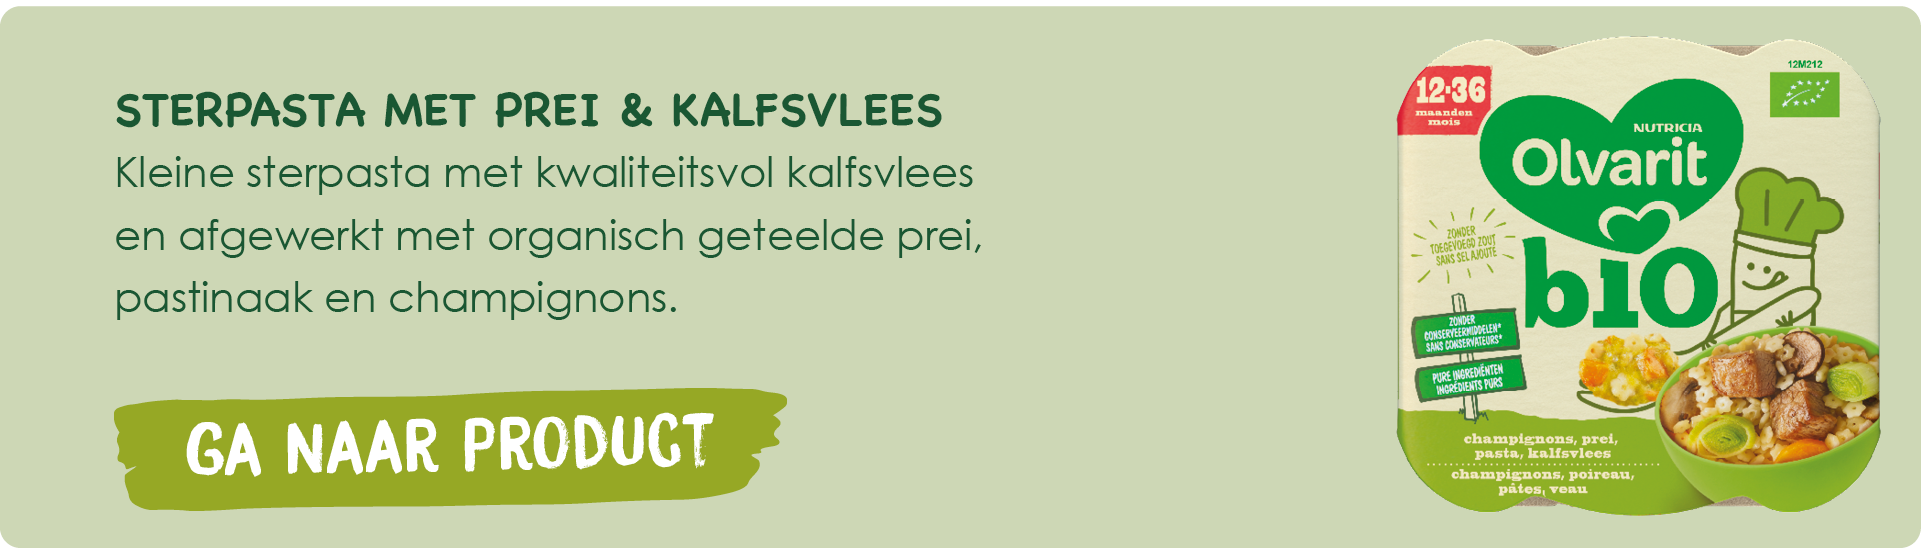 BIO Peuterbordjes sterpasta met prei & kalfsvlees